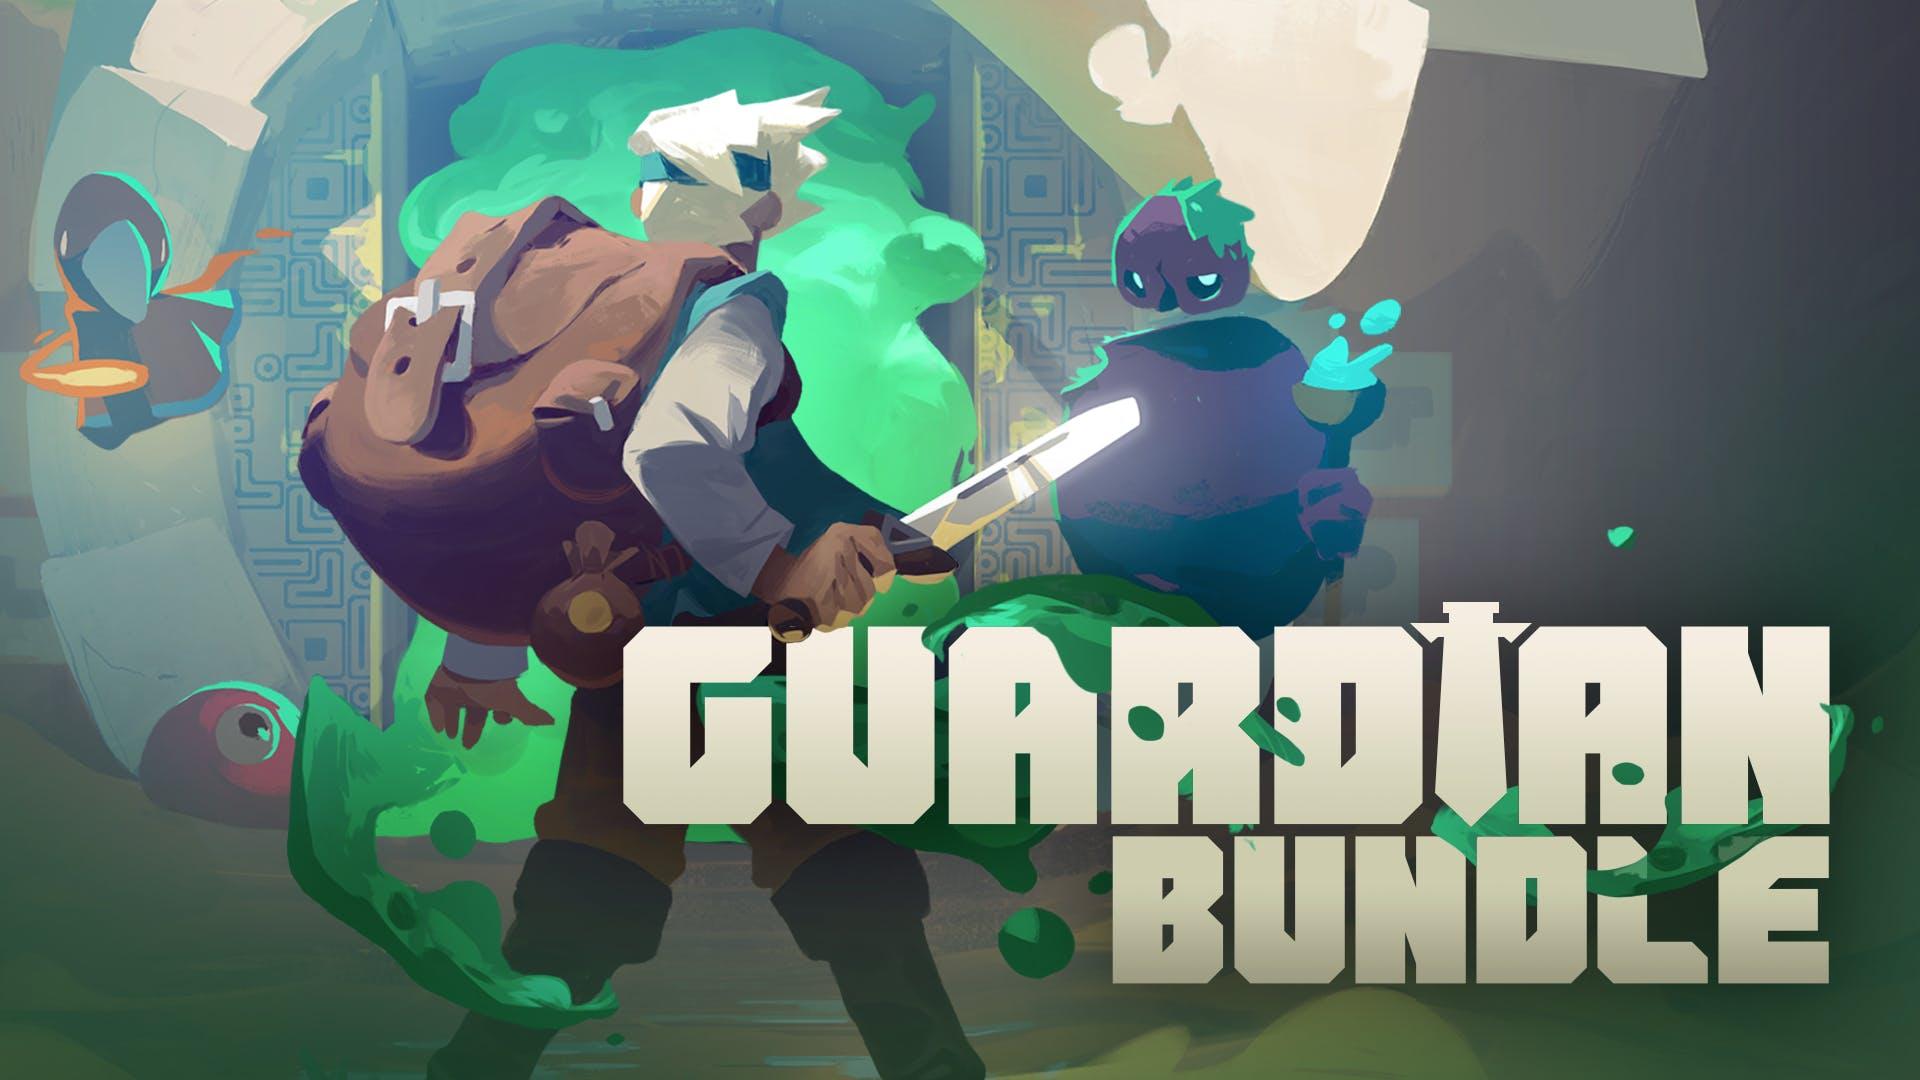 Guardian Bundle